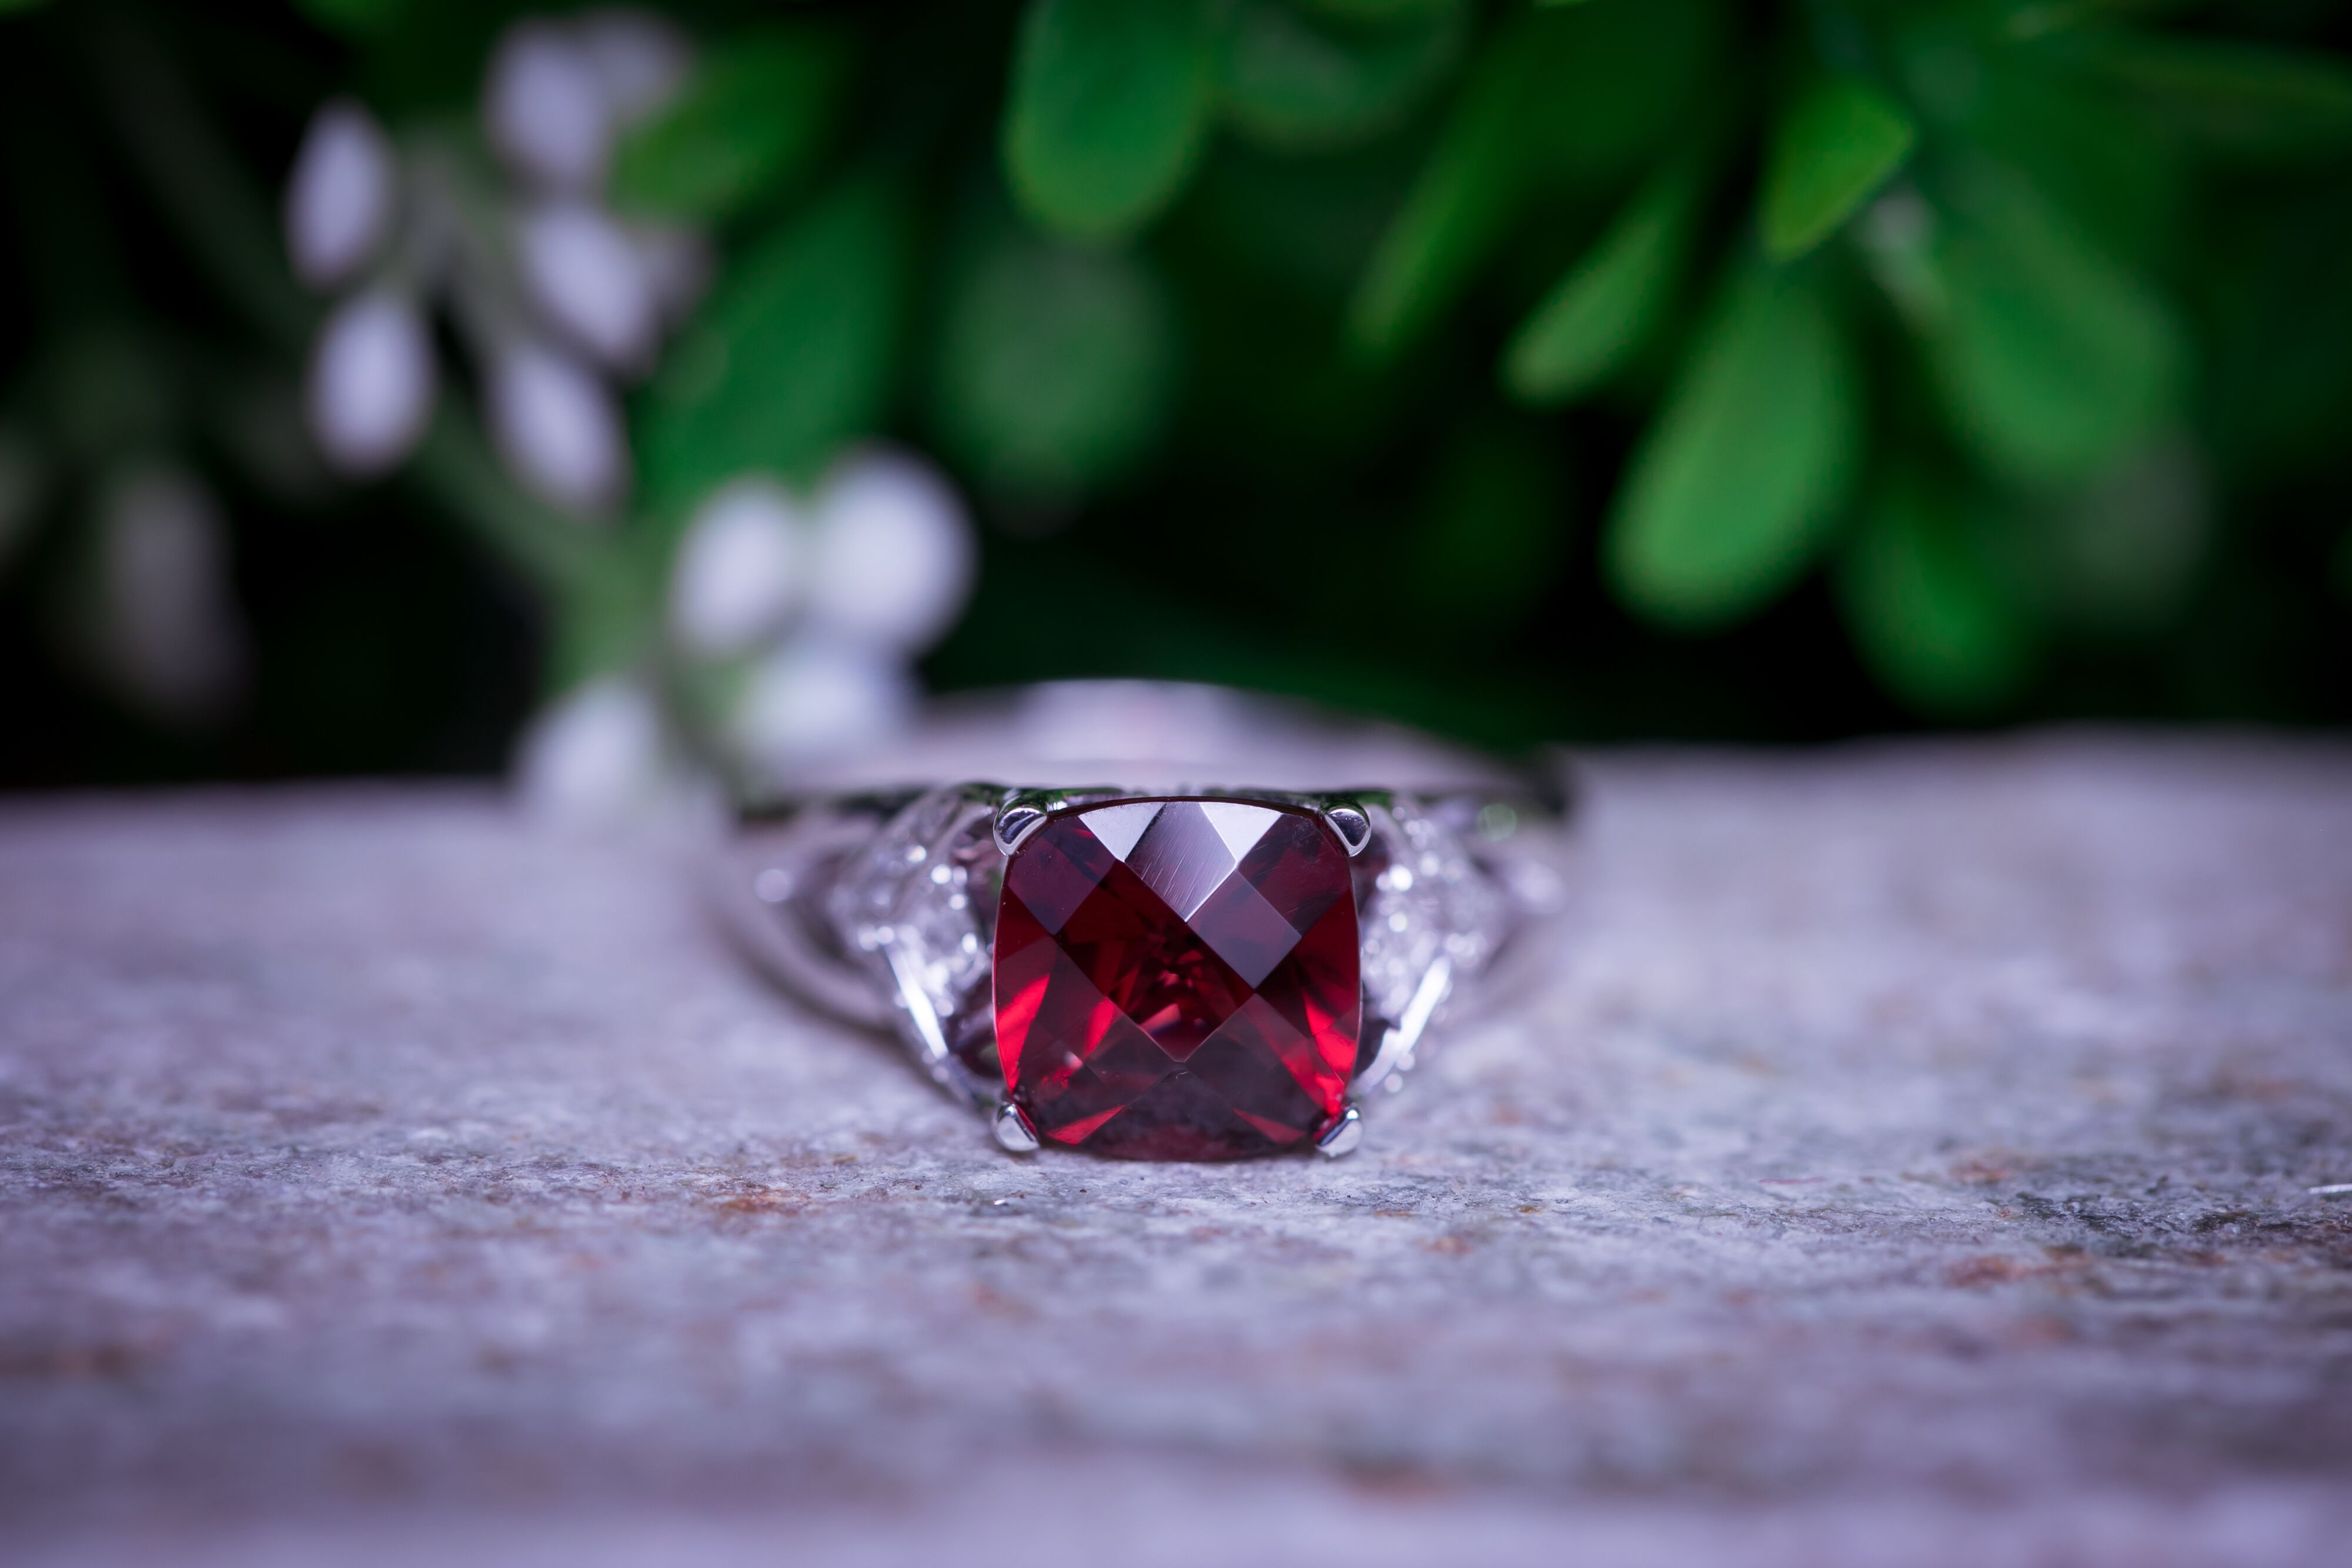 January's Gleaming Birthstone: Garnet Gemstone Rings